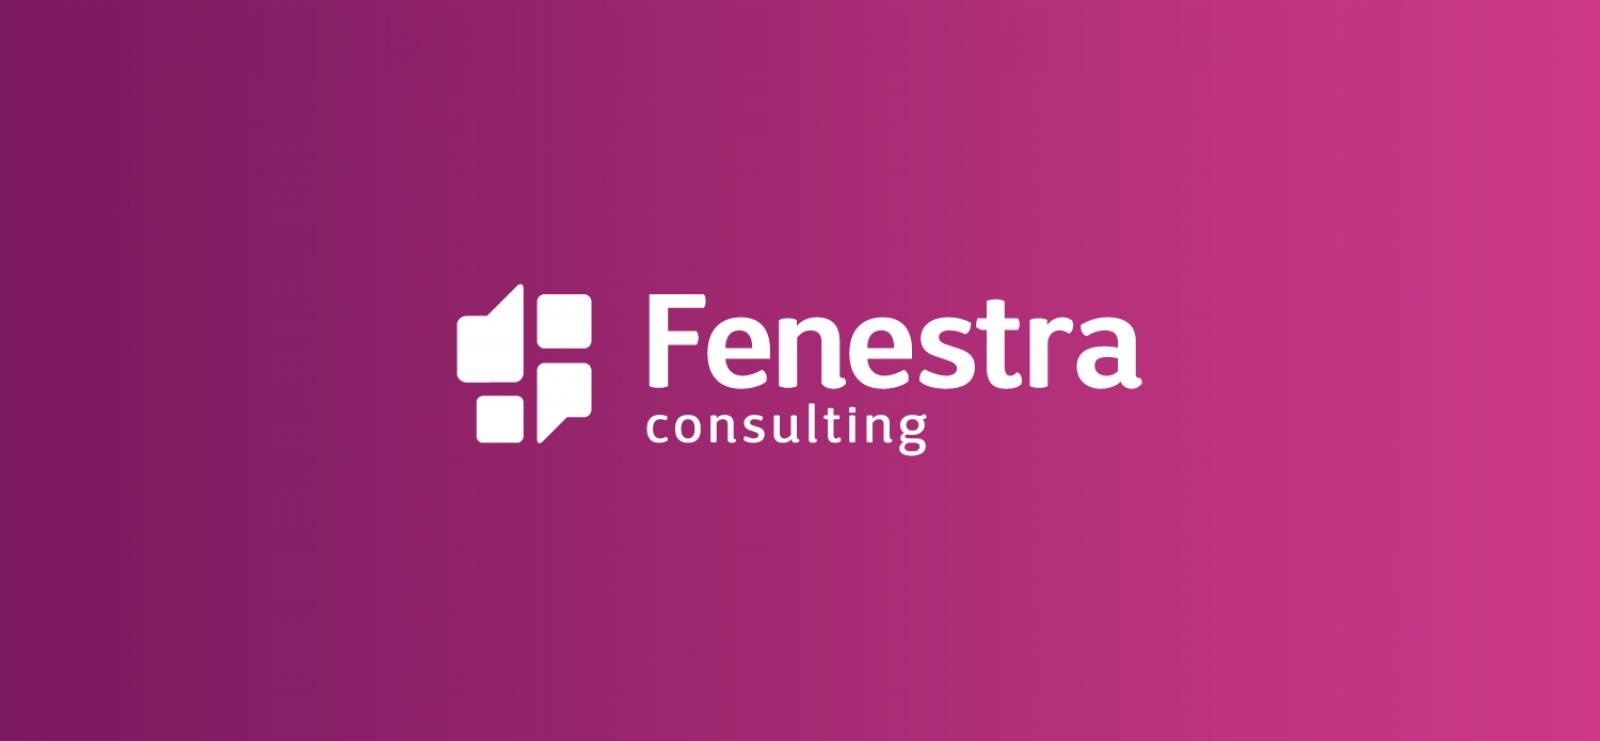 Fenestra-logo-design-agency-graphic-design-canterbury.jpg